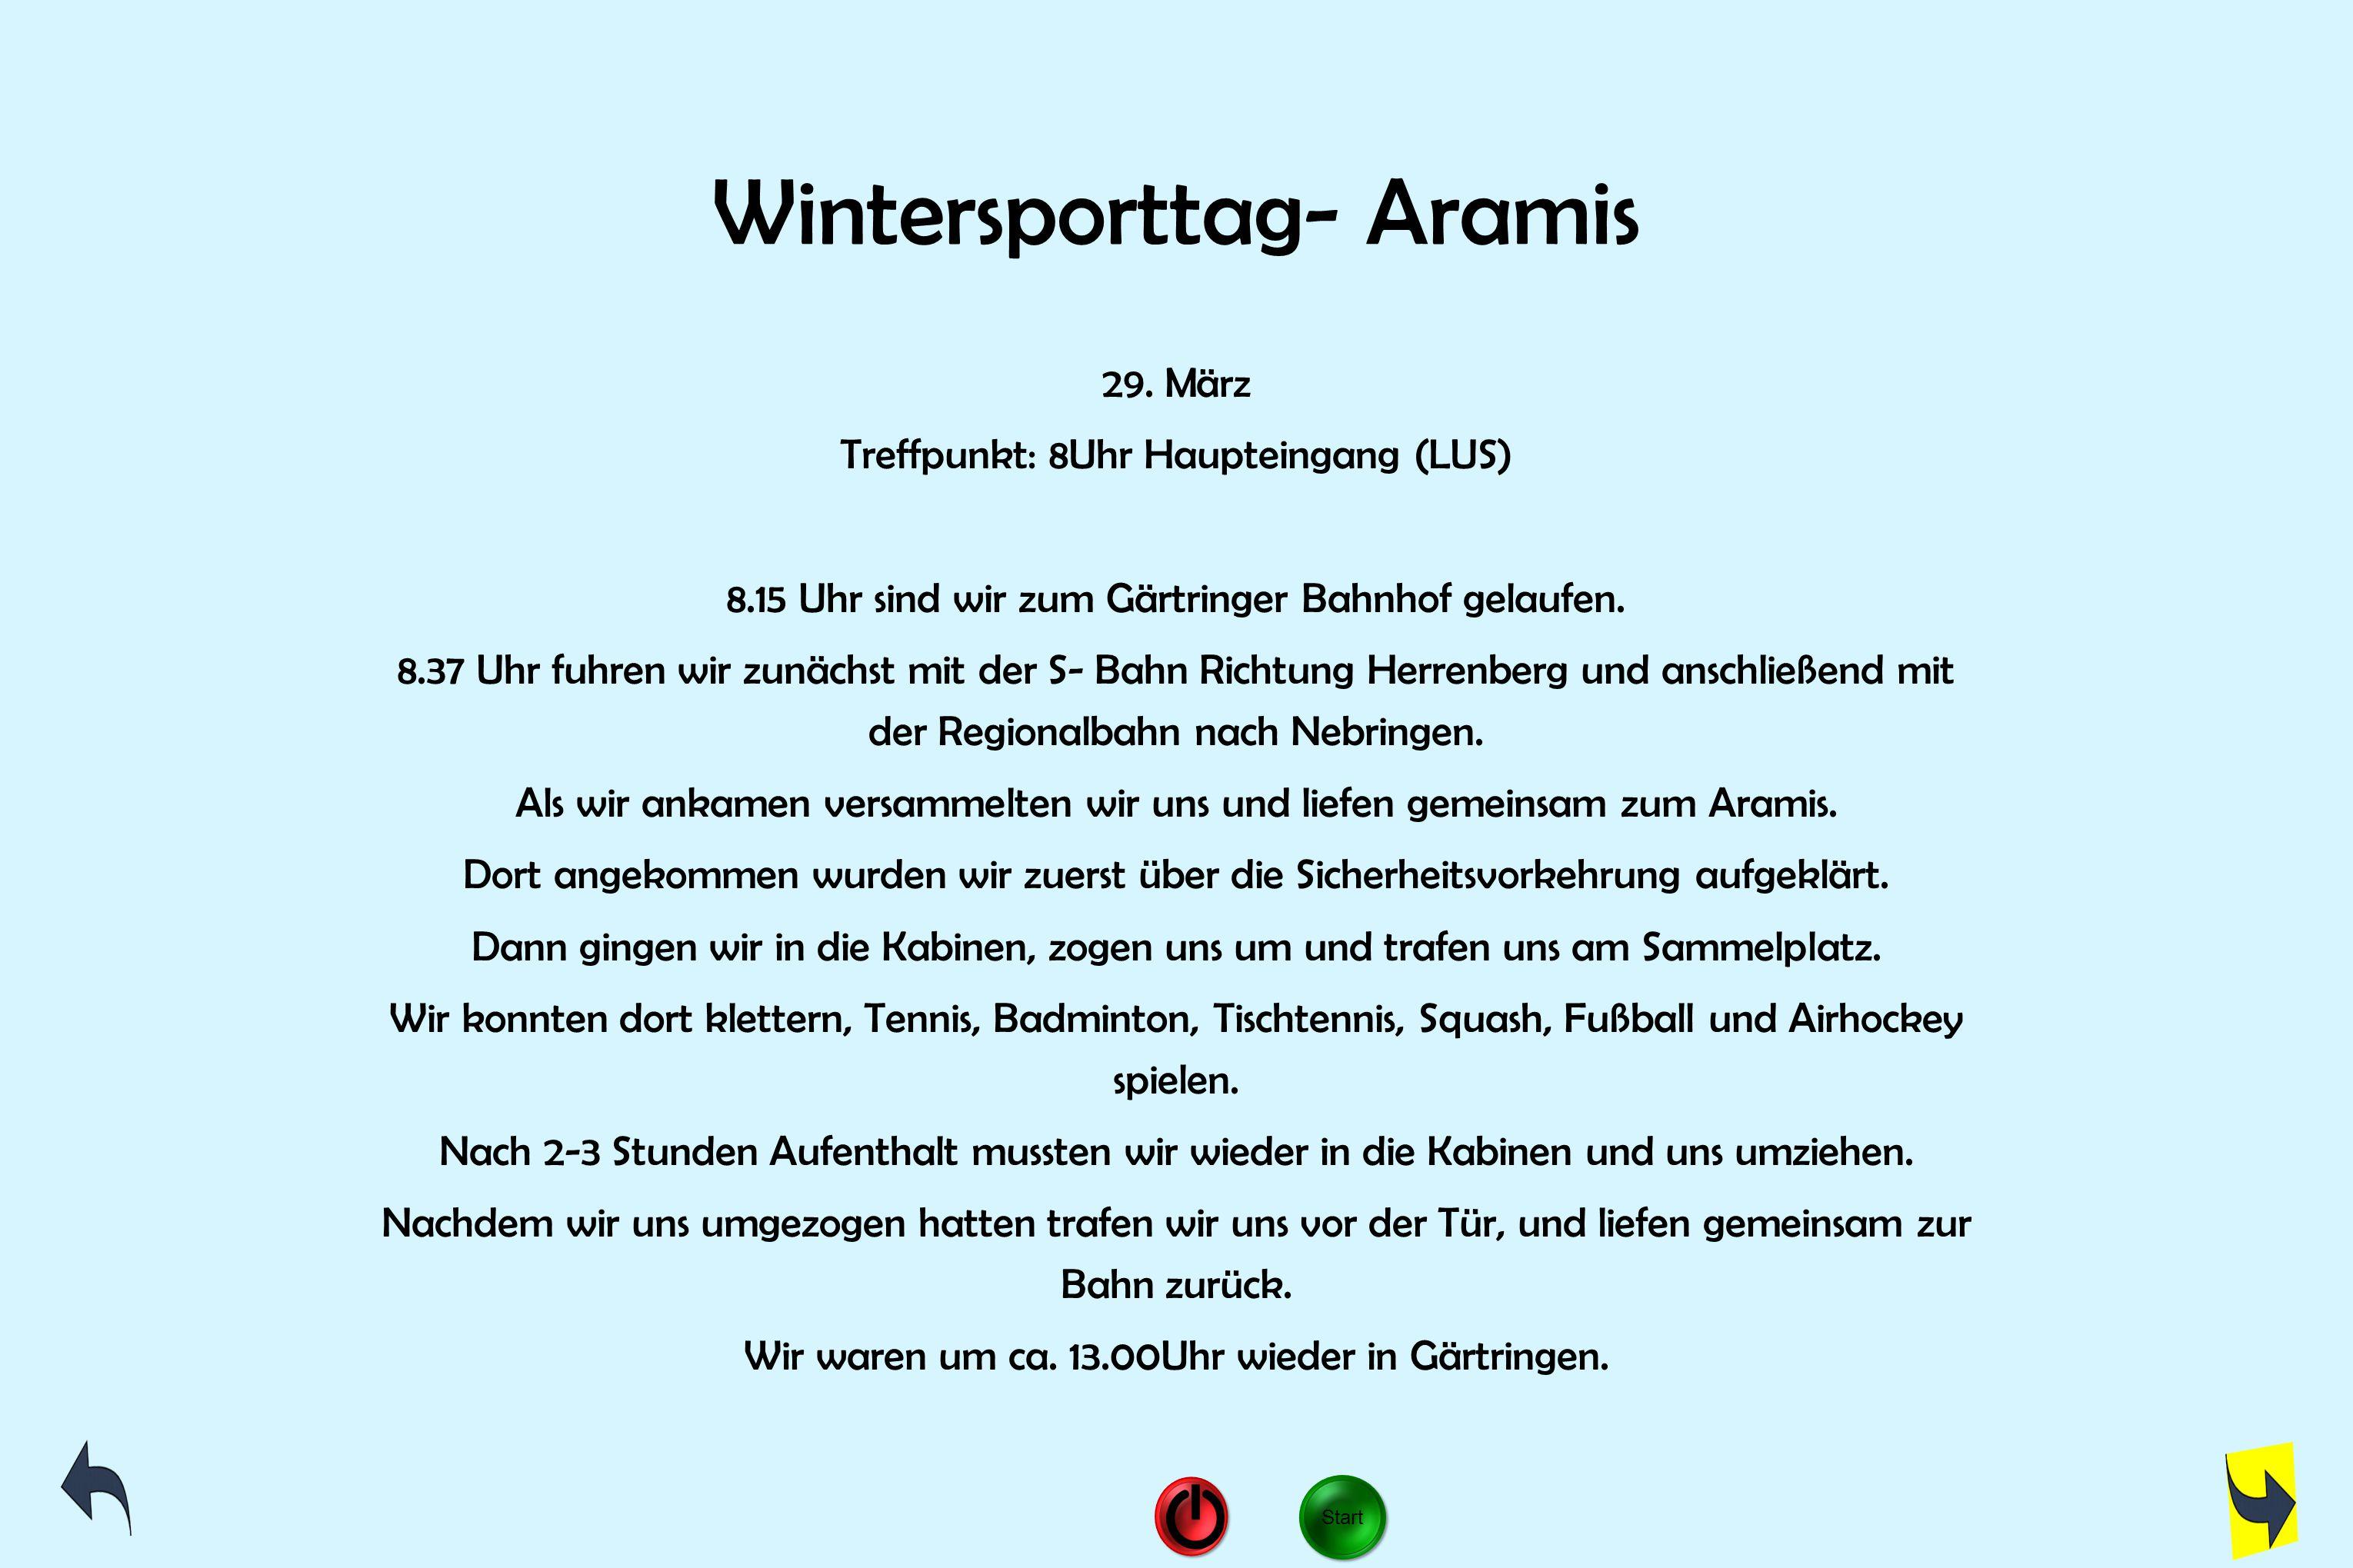 Wintersporttag- Filderado Am 29.